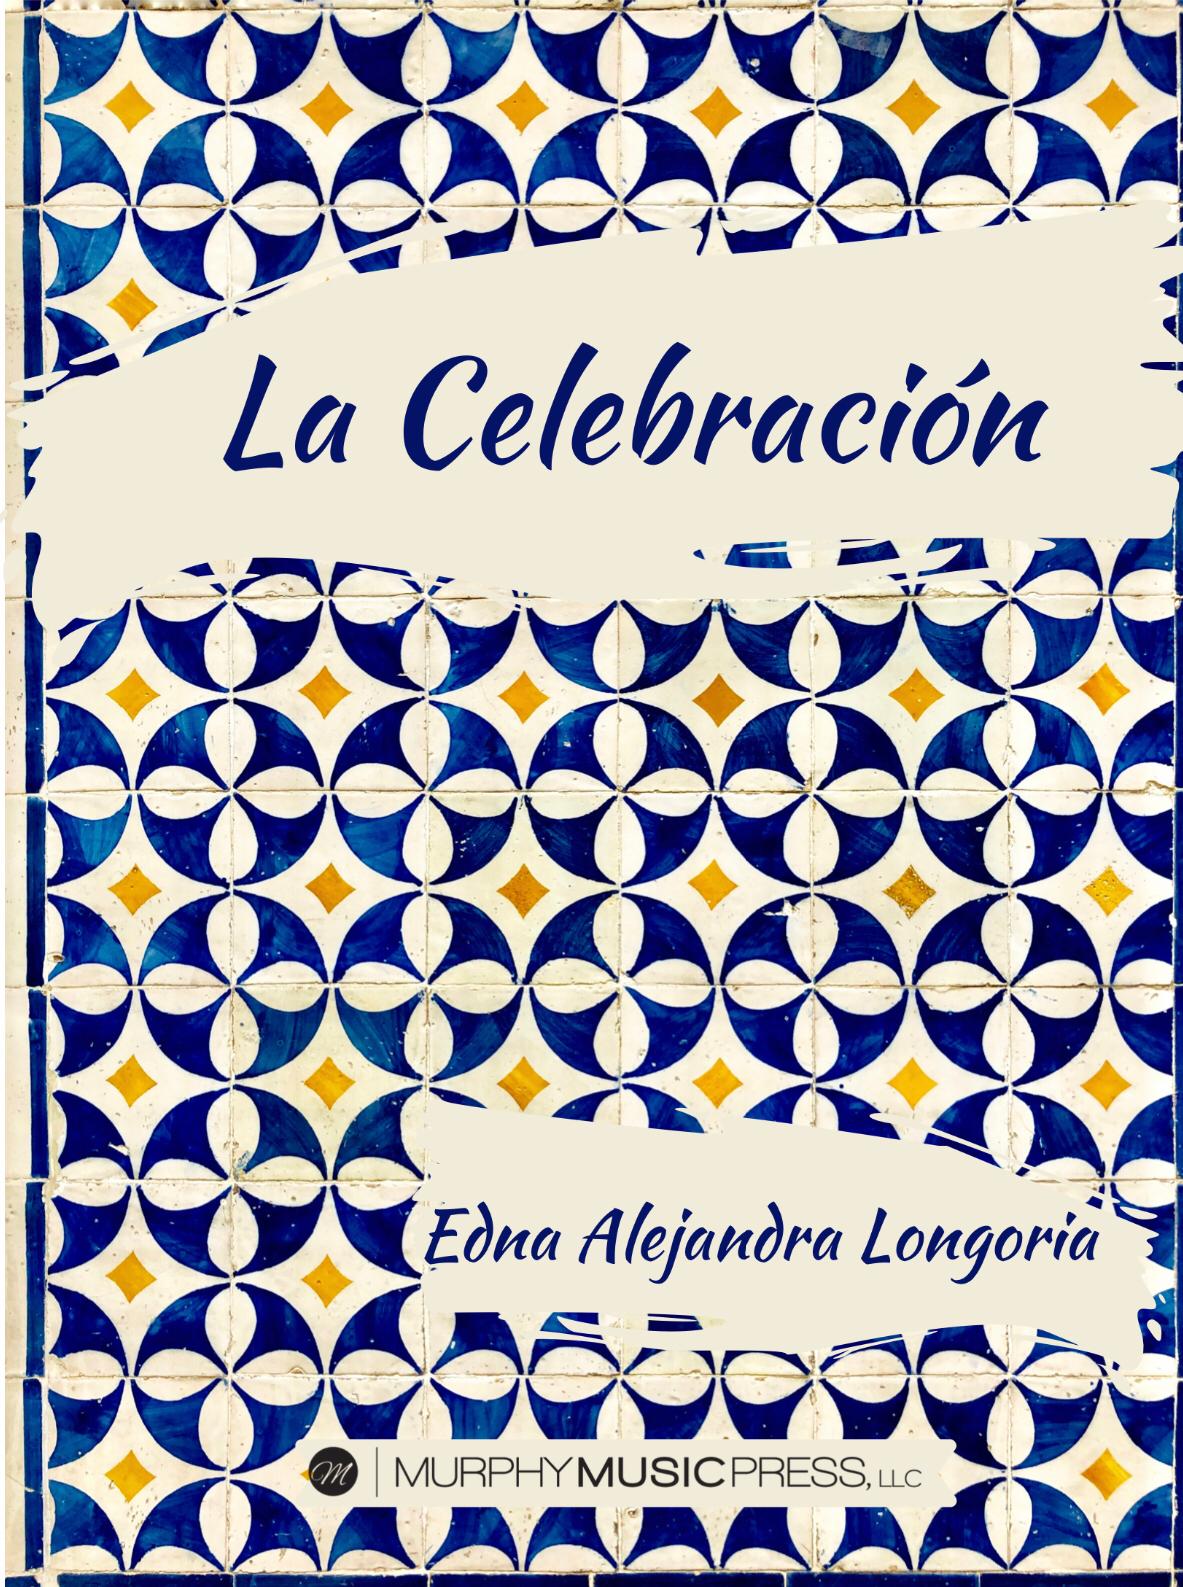 La Celebración (Score Only) by Edna Alejandra Longoria